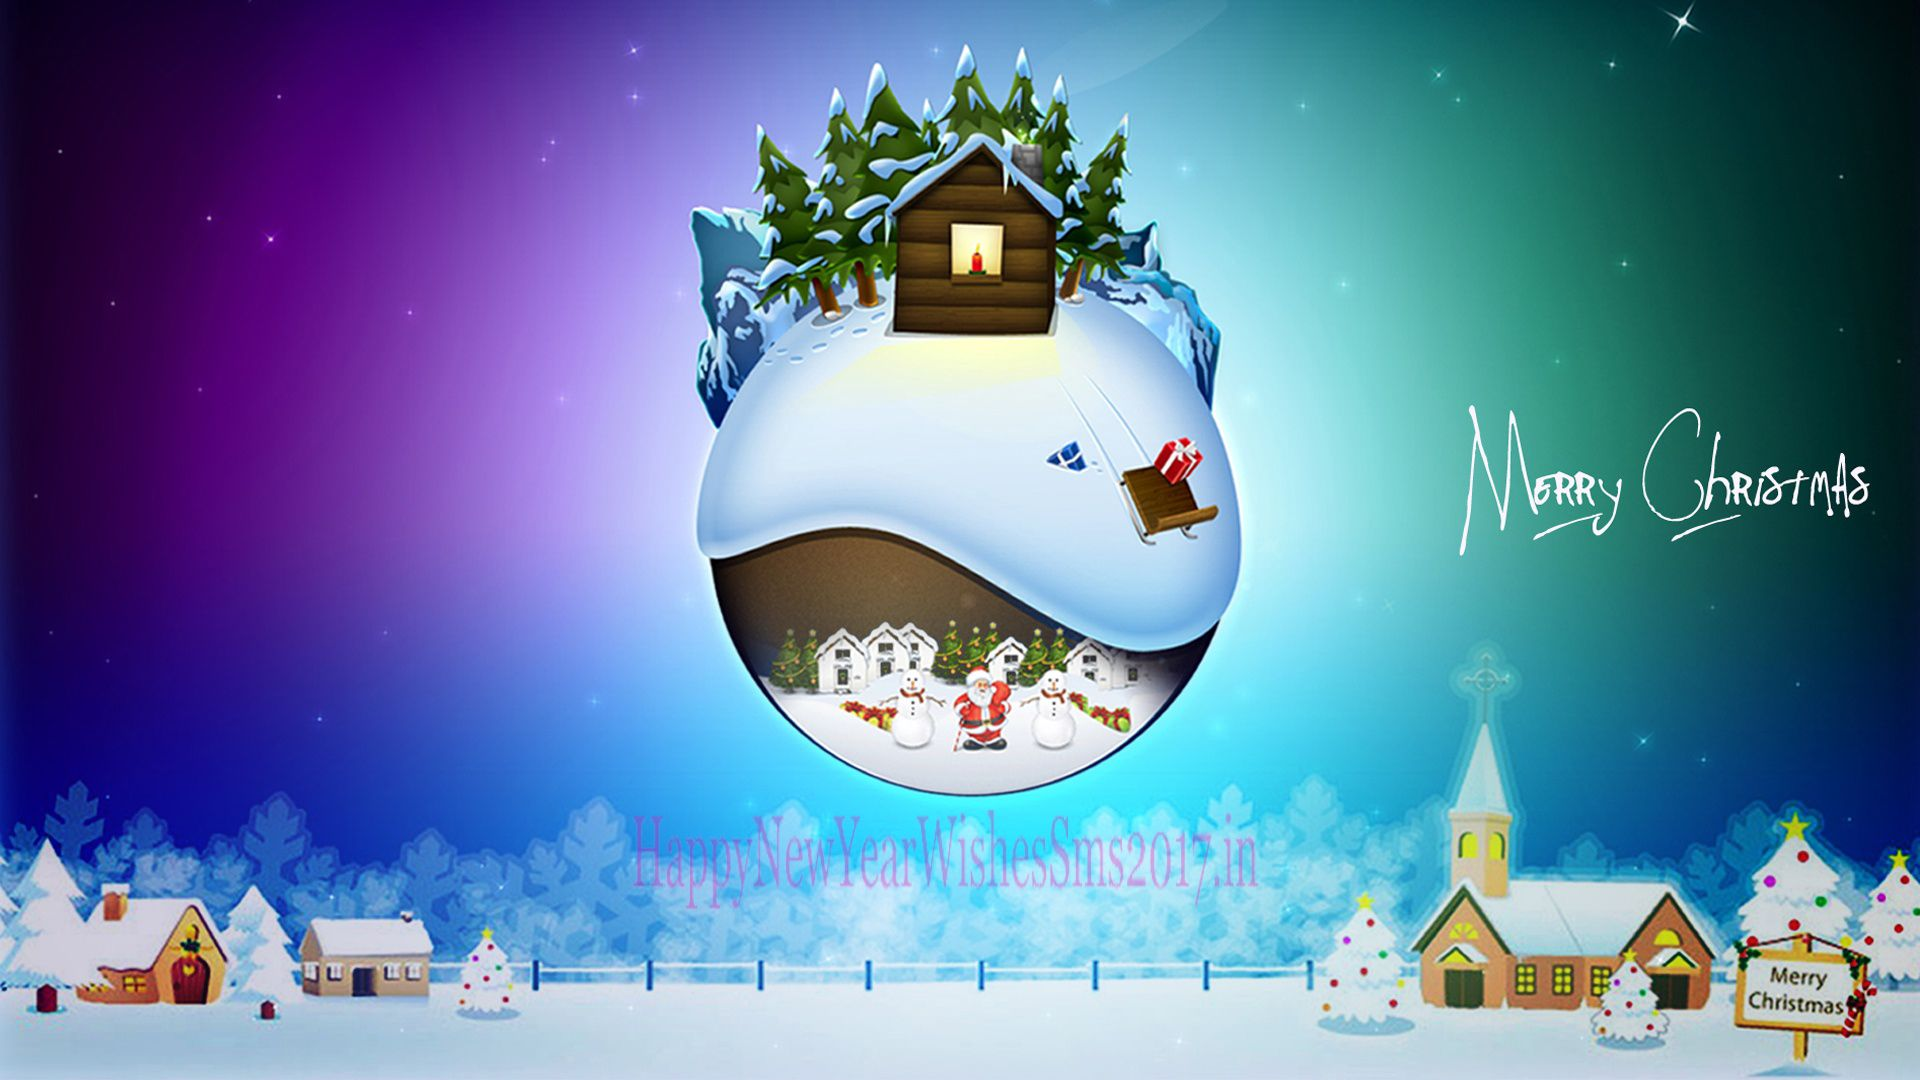 Merry Christmas SMS Christmas Greetings | Merry Christmas SMS ...